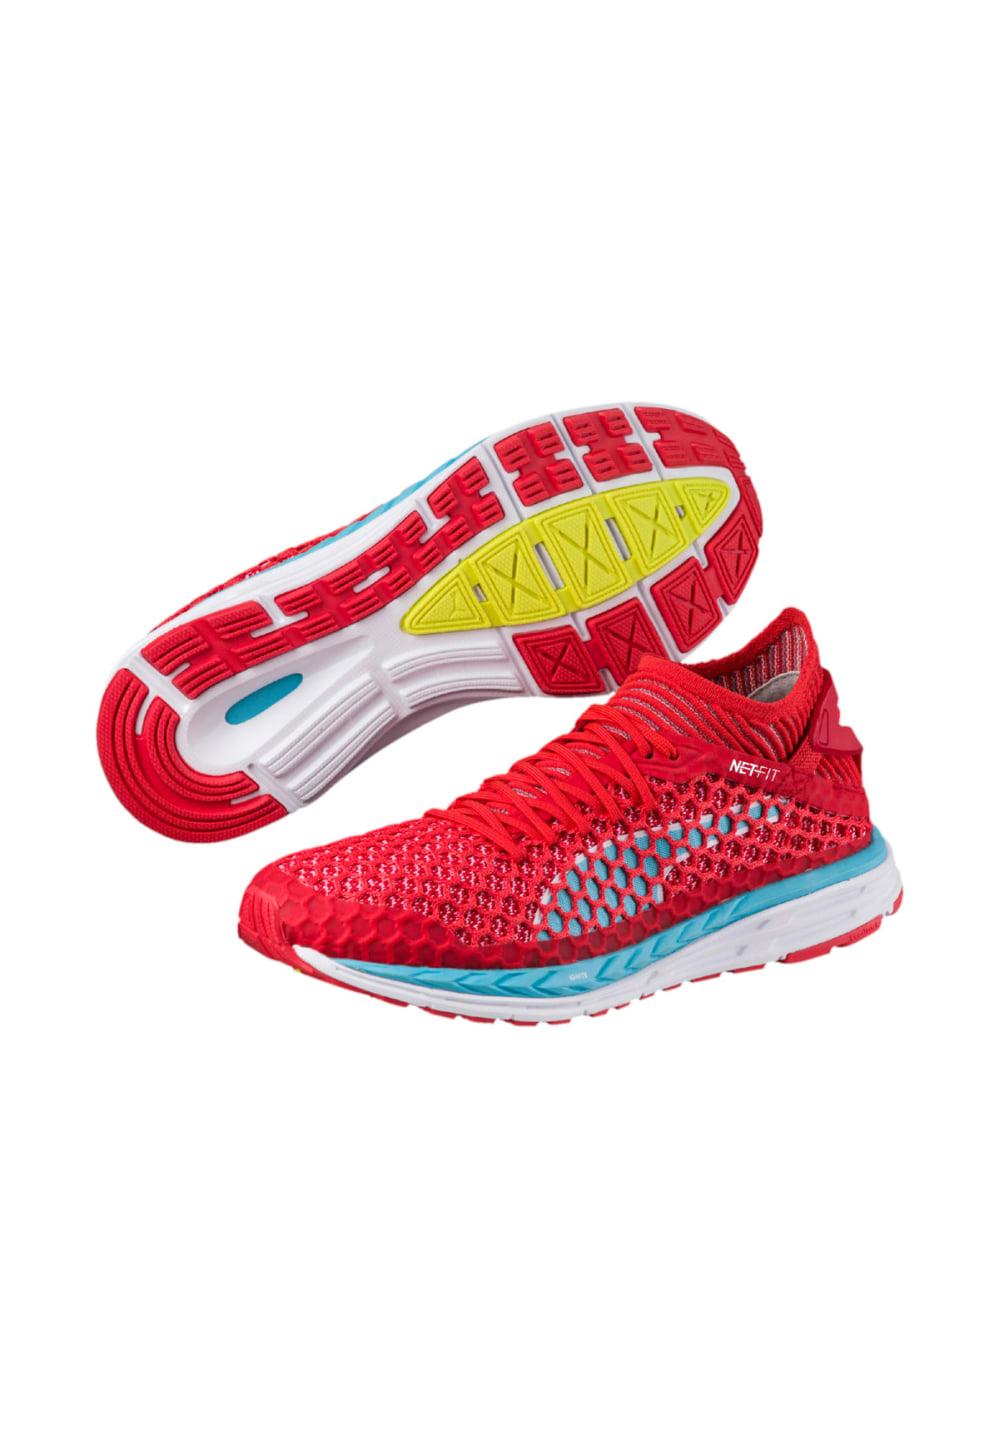 Puma Netfit Chaussures Ignite 21run Femme Running Speed Rouge Pour rqrvnx6w